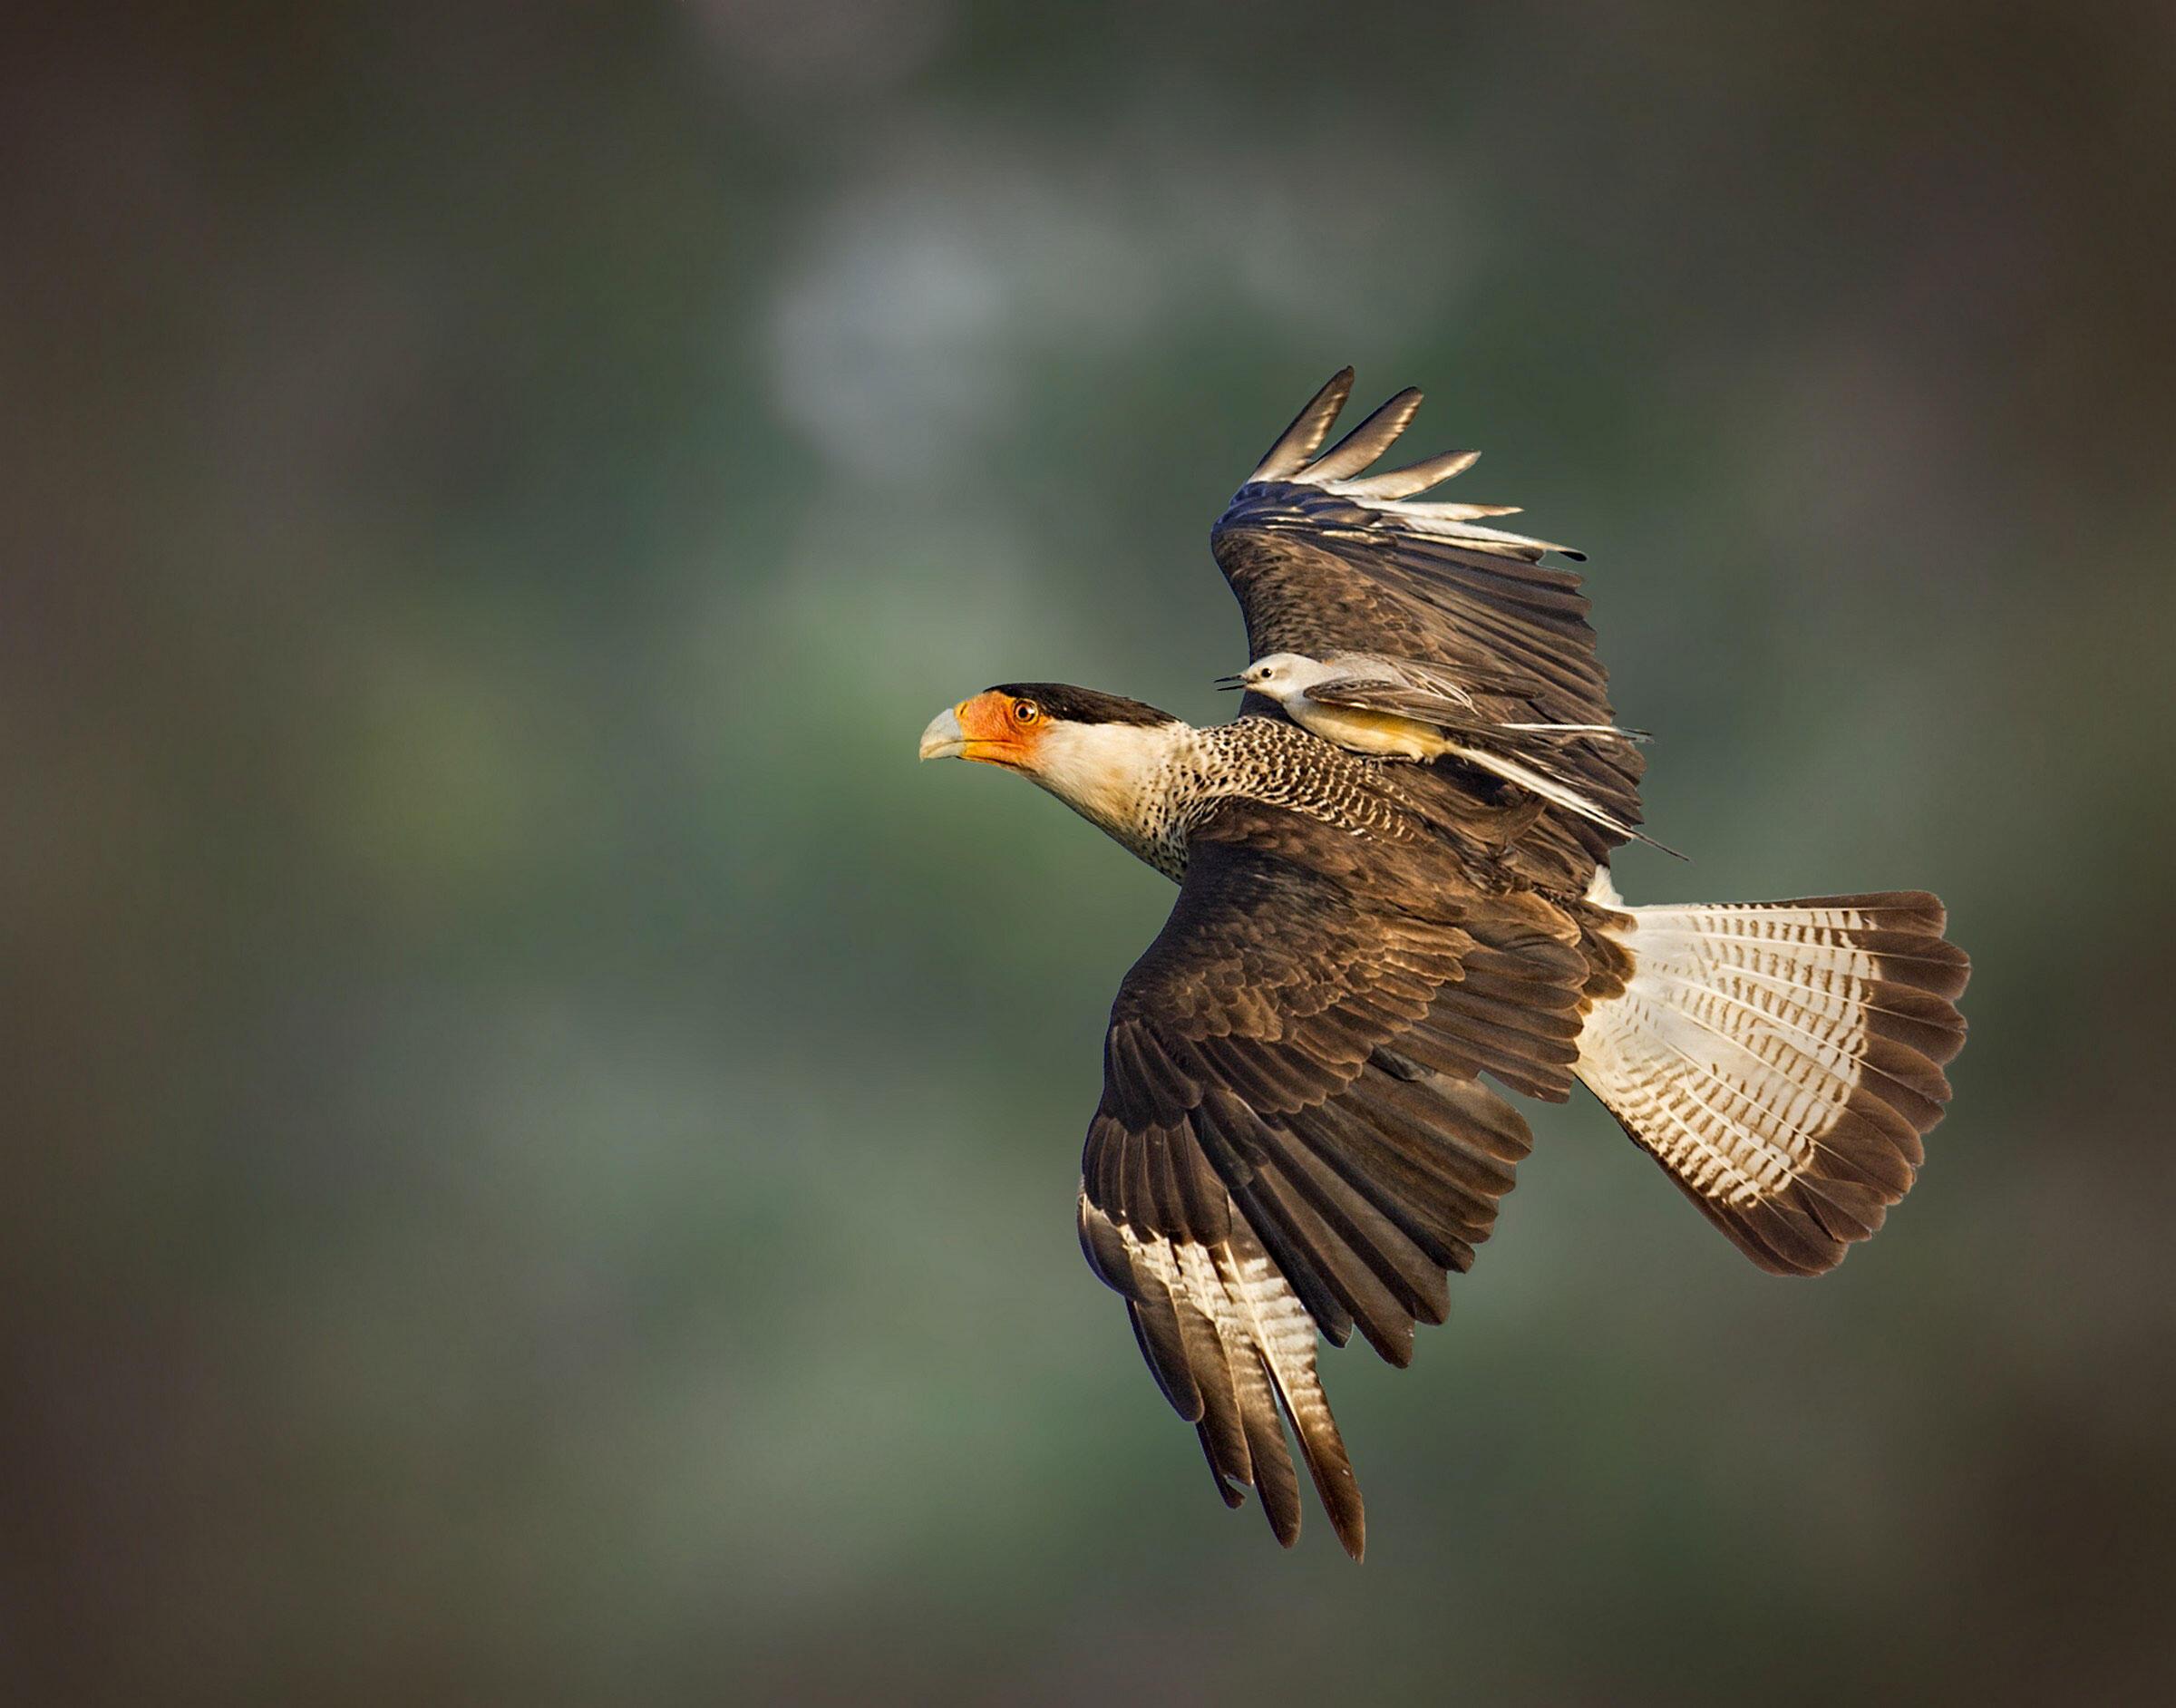 Crested Caracara and Scissor-tailed Flycatcher/Fine Art Category. Jerry Black/Audubon Photography Awards